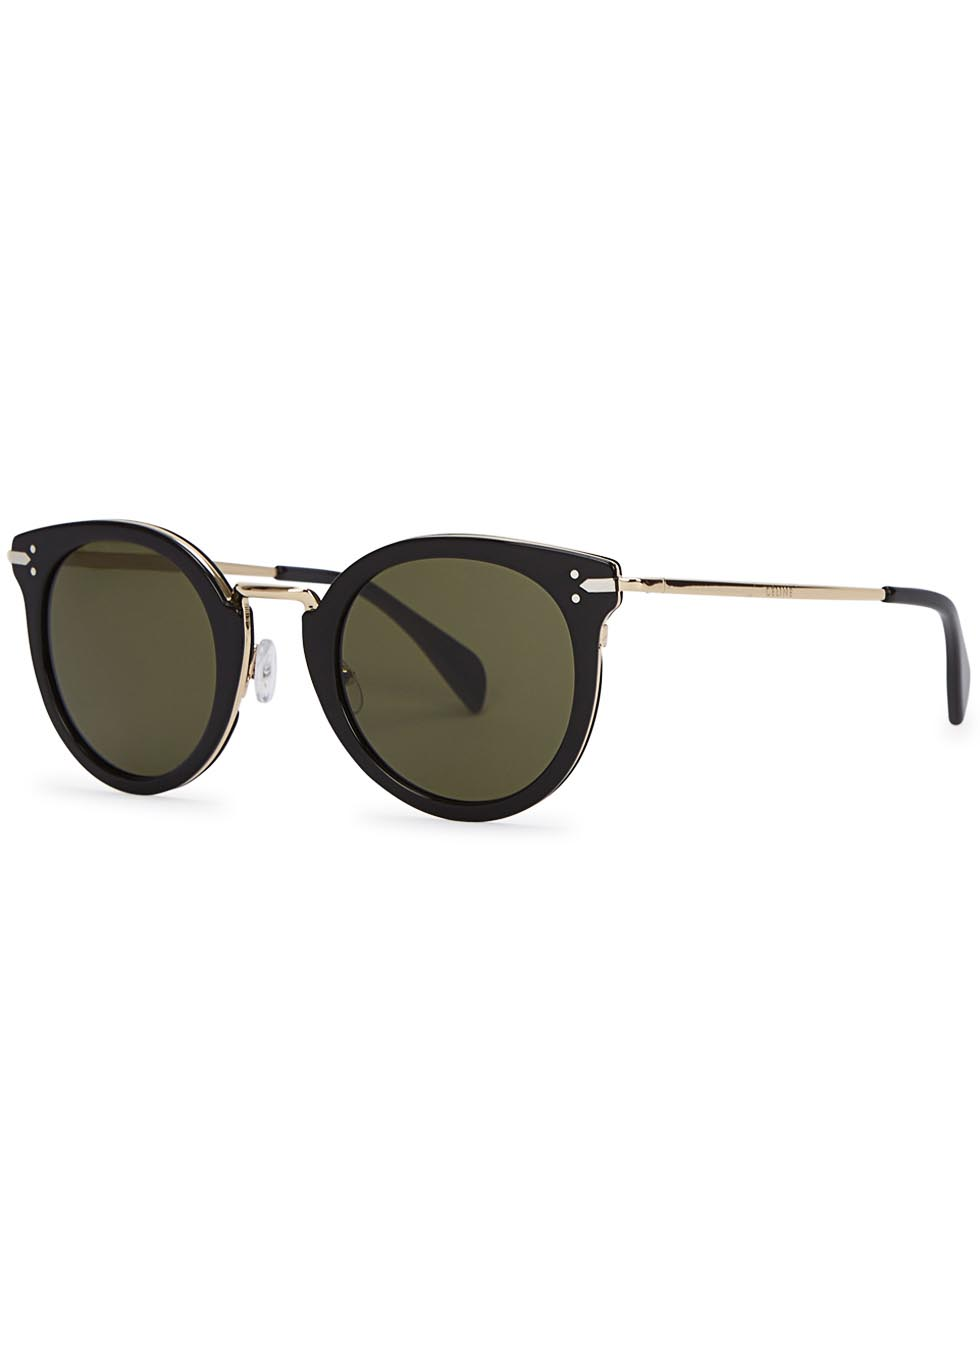 Lea round-frame sunglasses - Celine